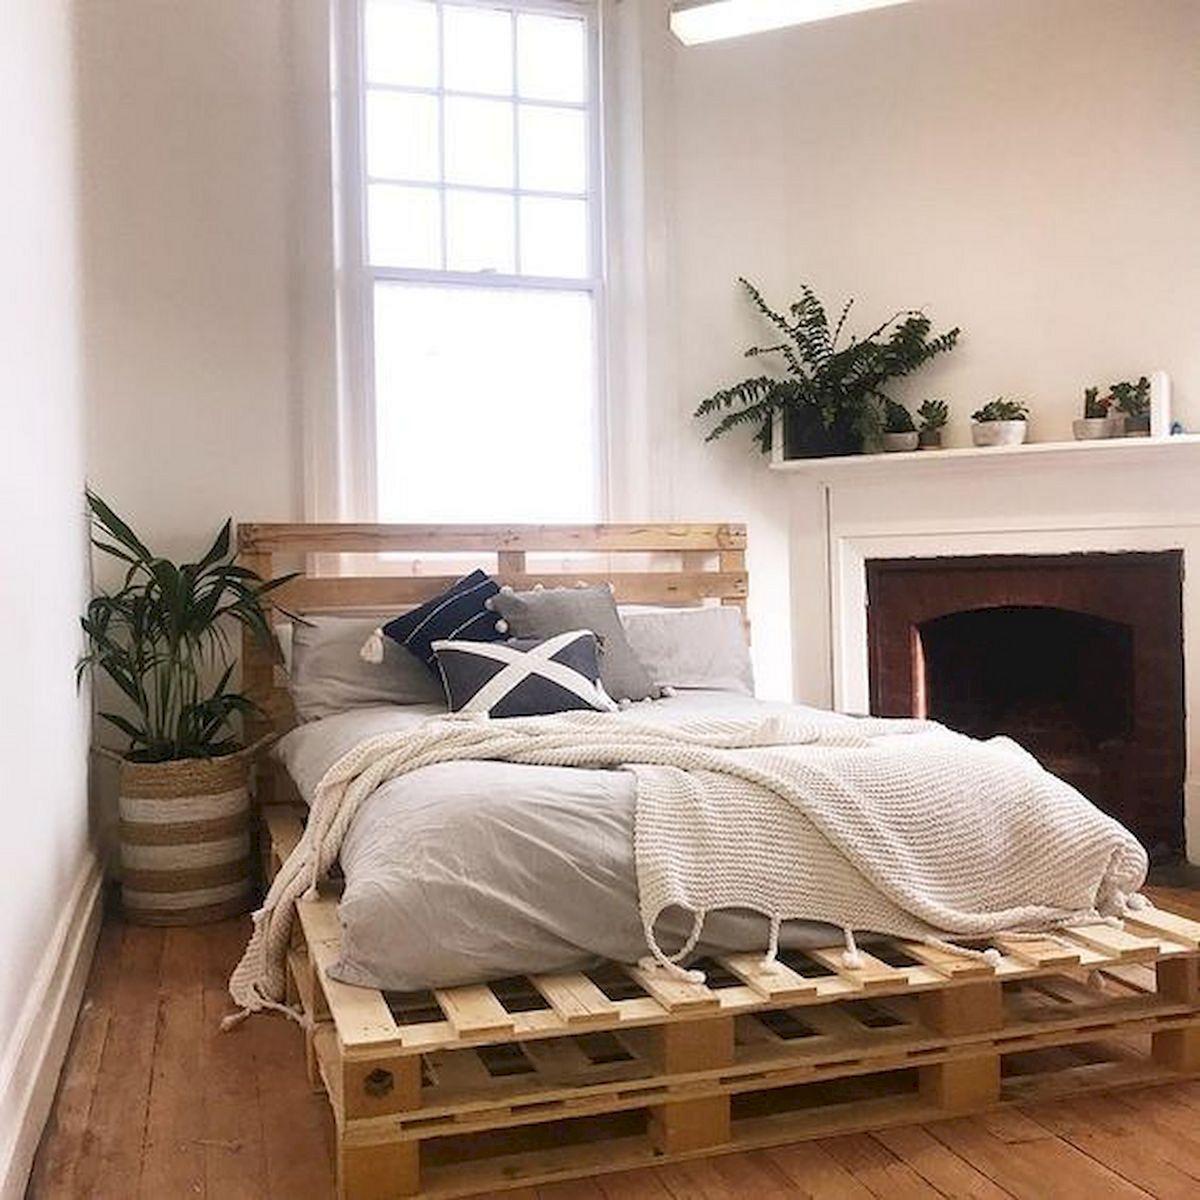 Diy Wood Bed Frame To Make Your Sleep Comfortable At Home Diy